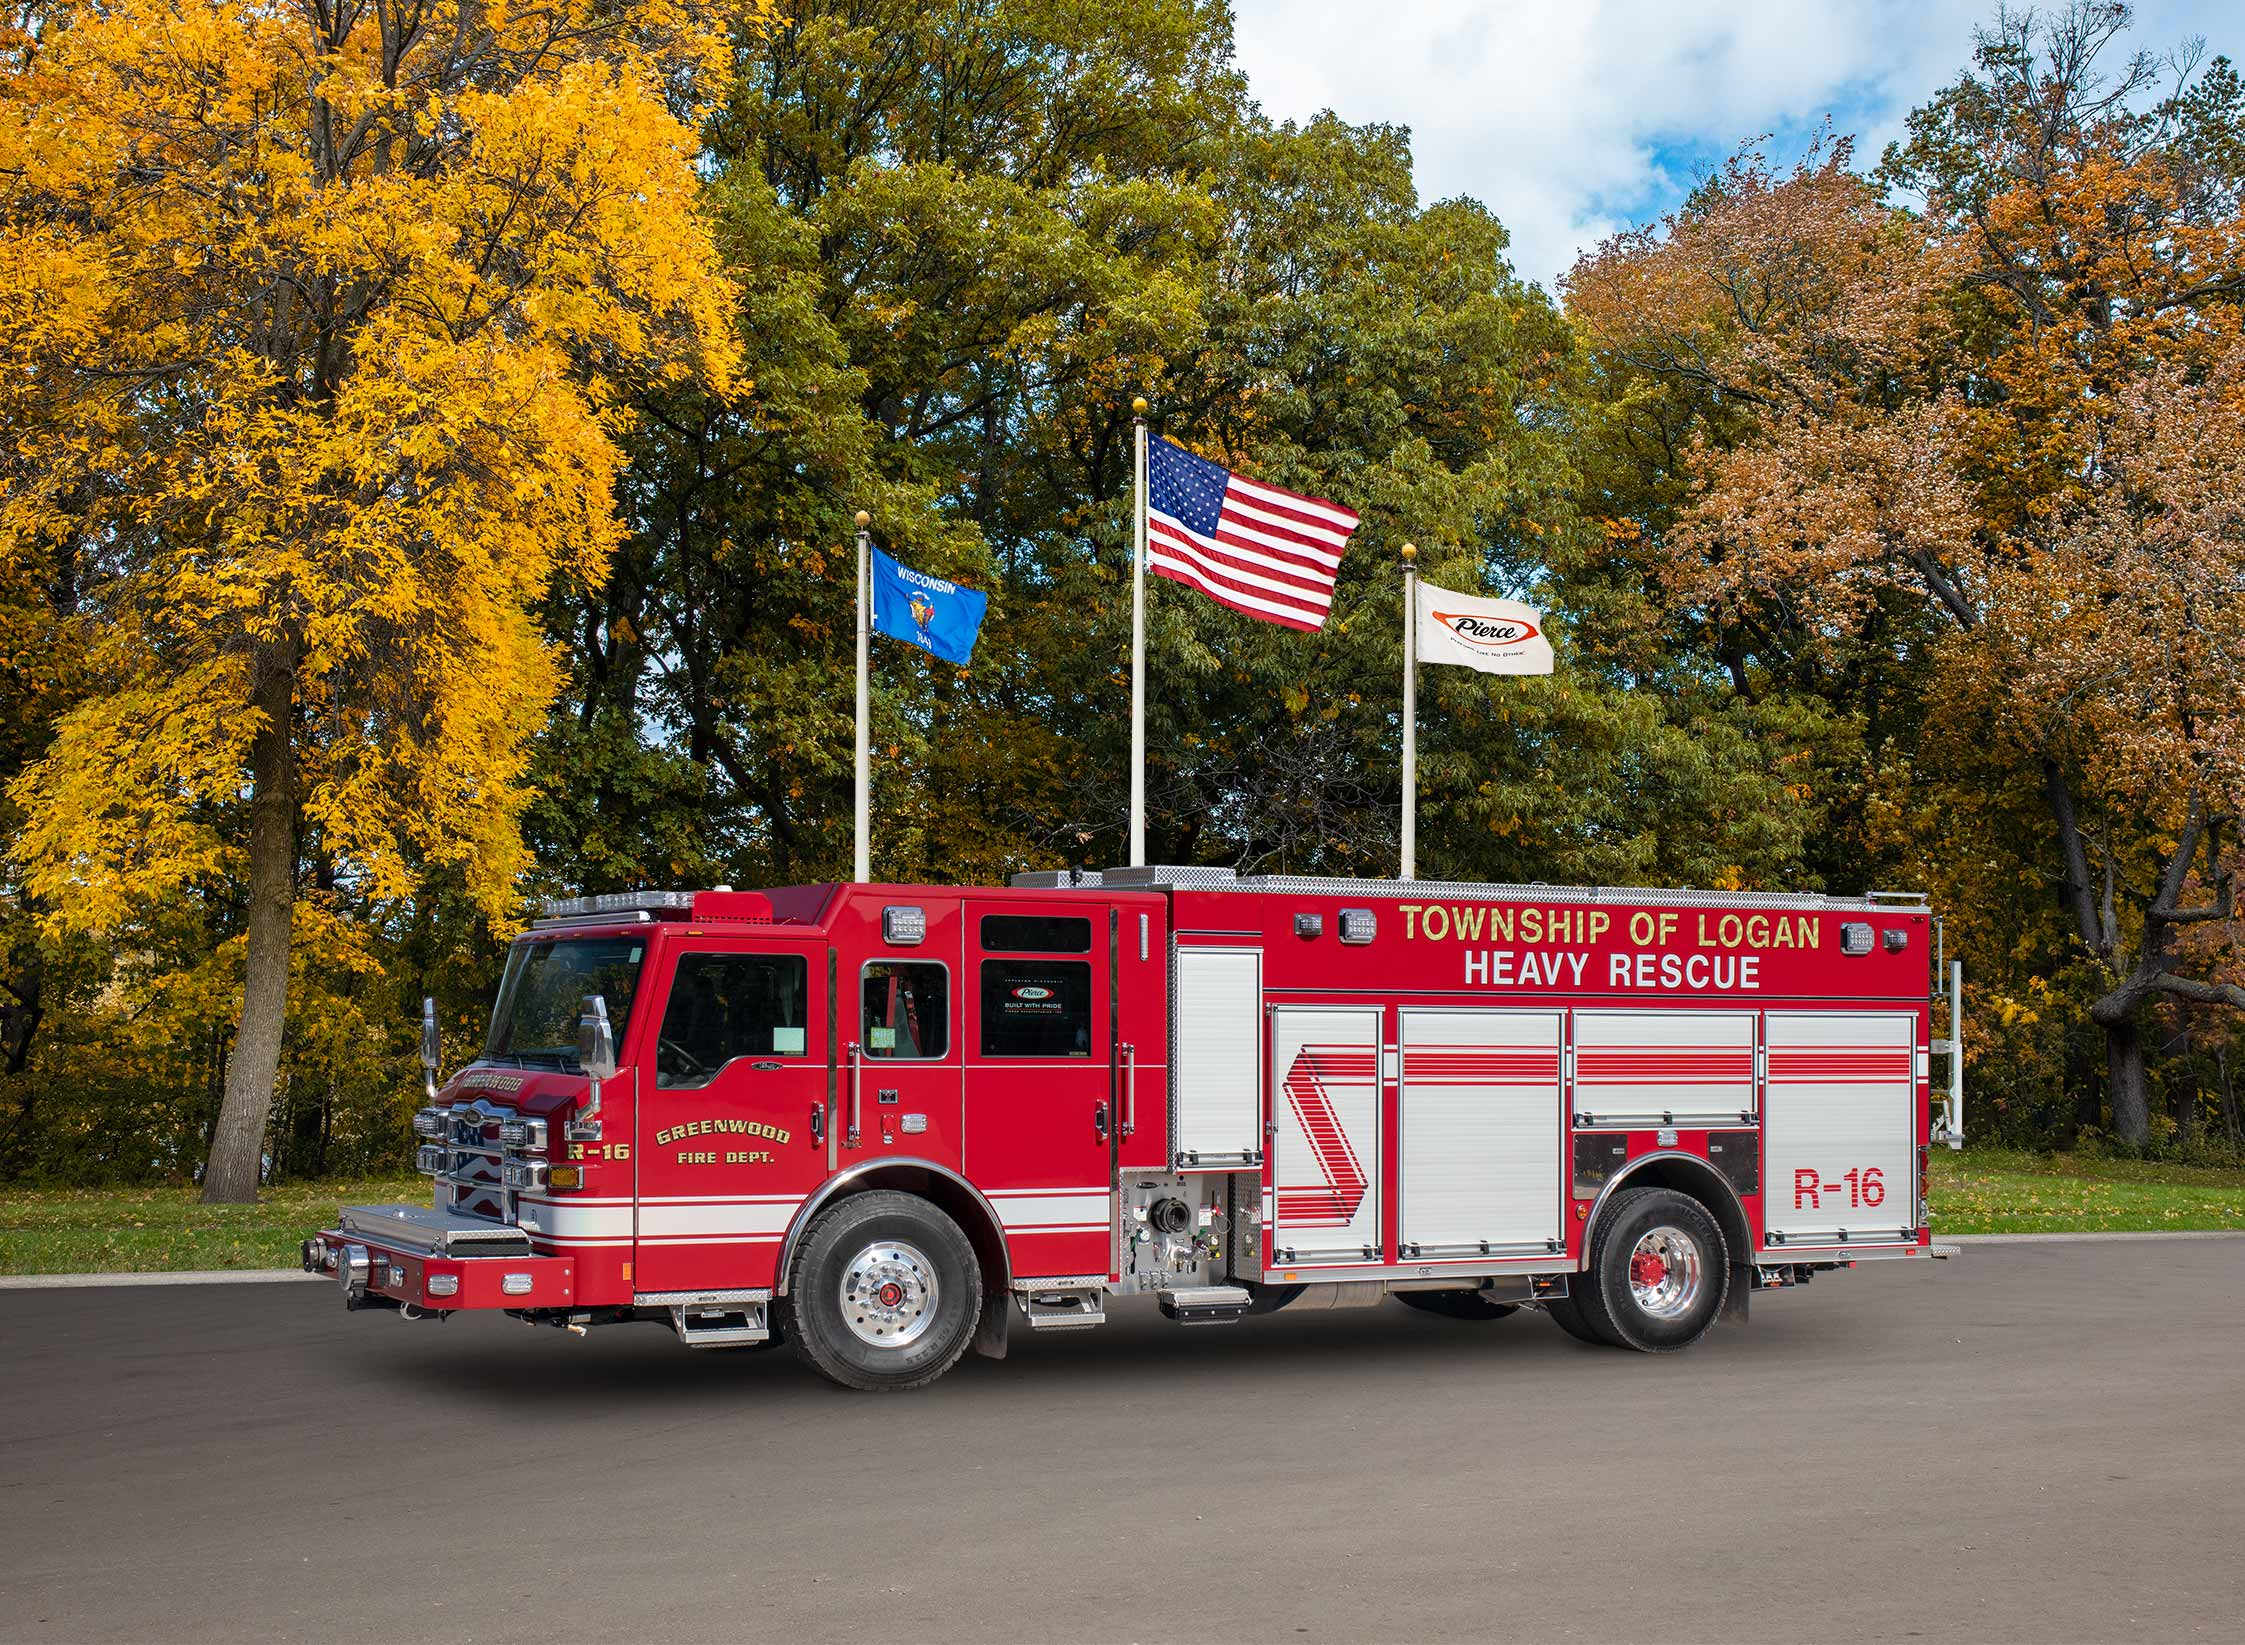 Logan Township Greenwood Fire Company - Pumper